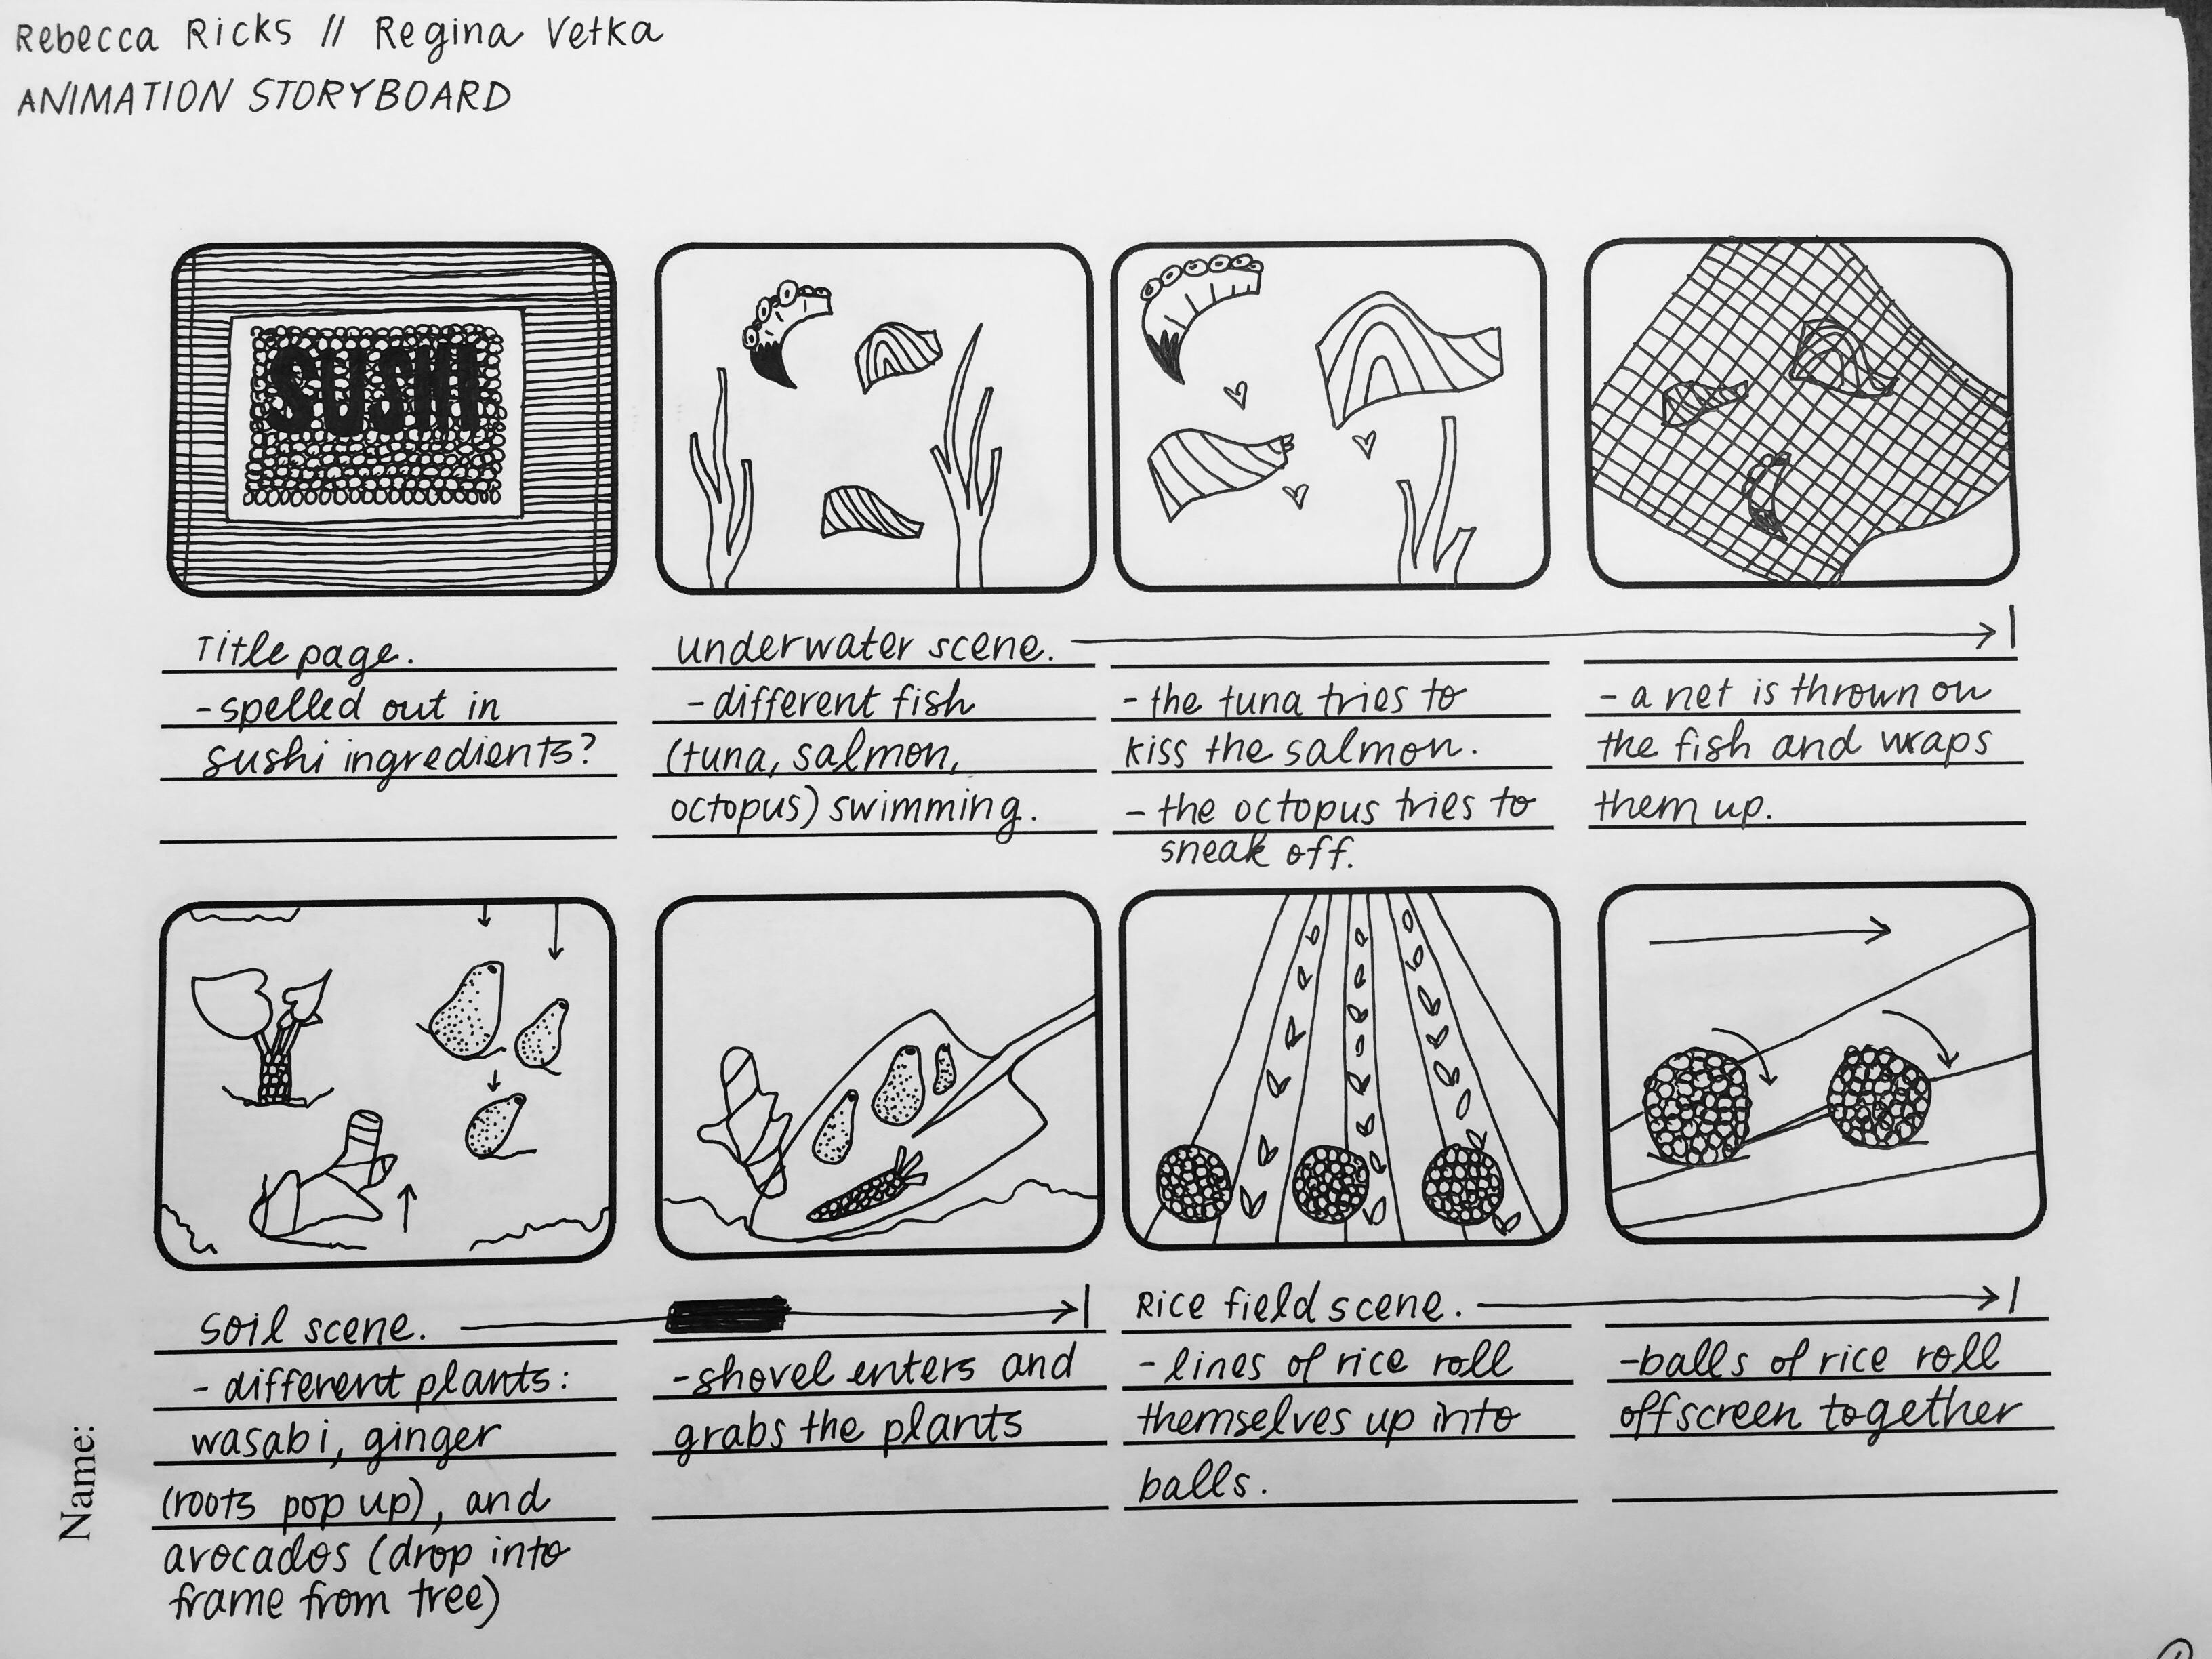 stop motion animation: kawaii sushi. – rebecca ricks